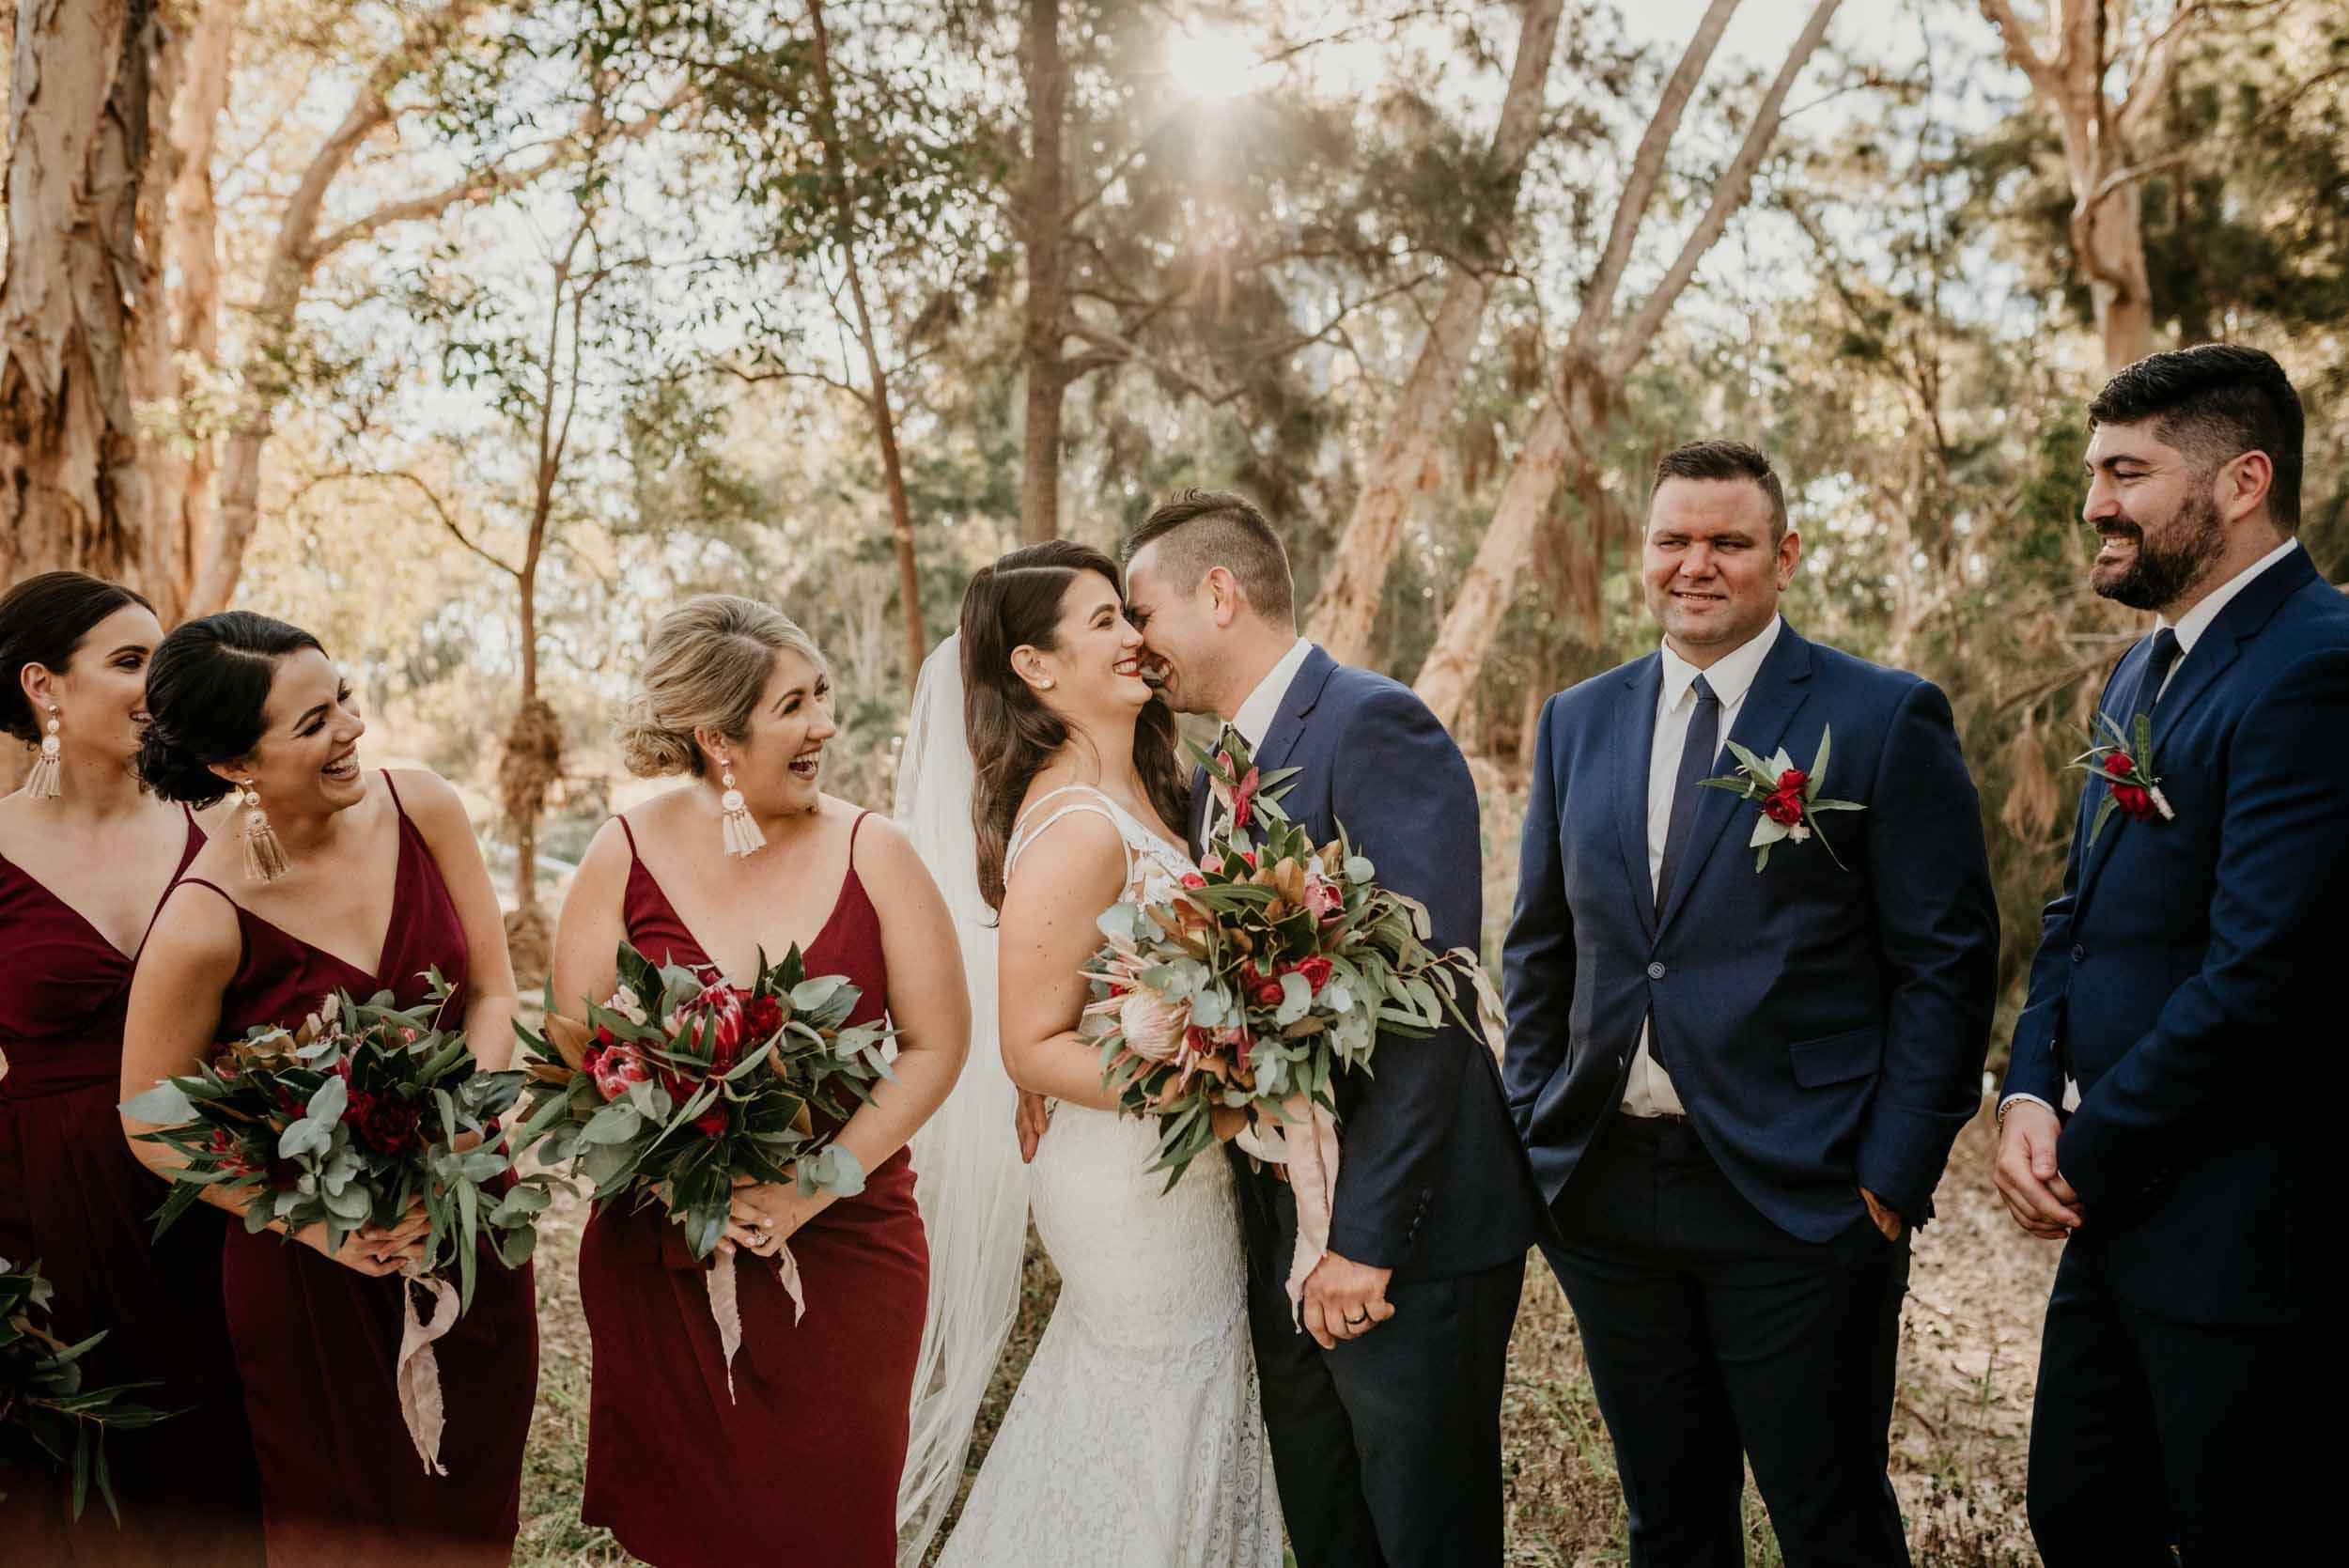 The Raw Photographer - Cairns Wedding Photographer - Atherton Tablelands - Mareeba farm Wedding - Irene Costa's Devine Bridal - Candid - Photo Package-33.jpg